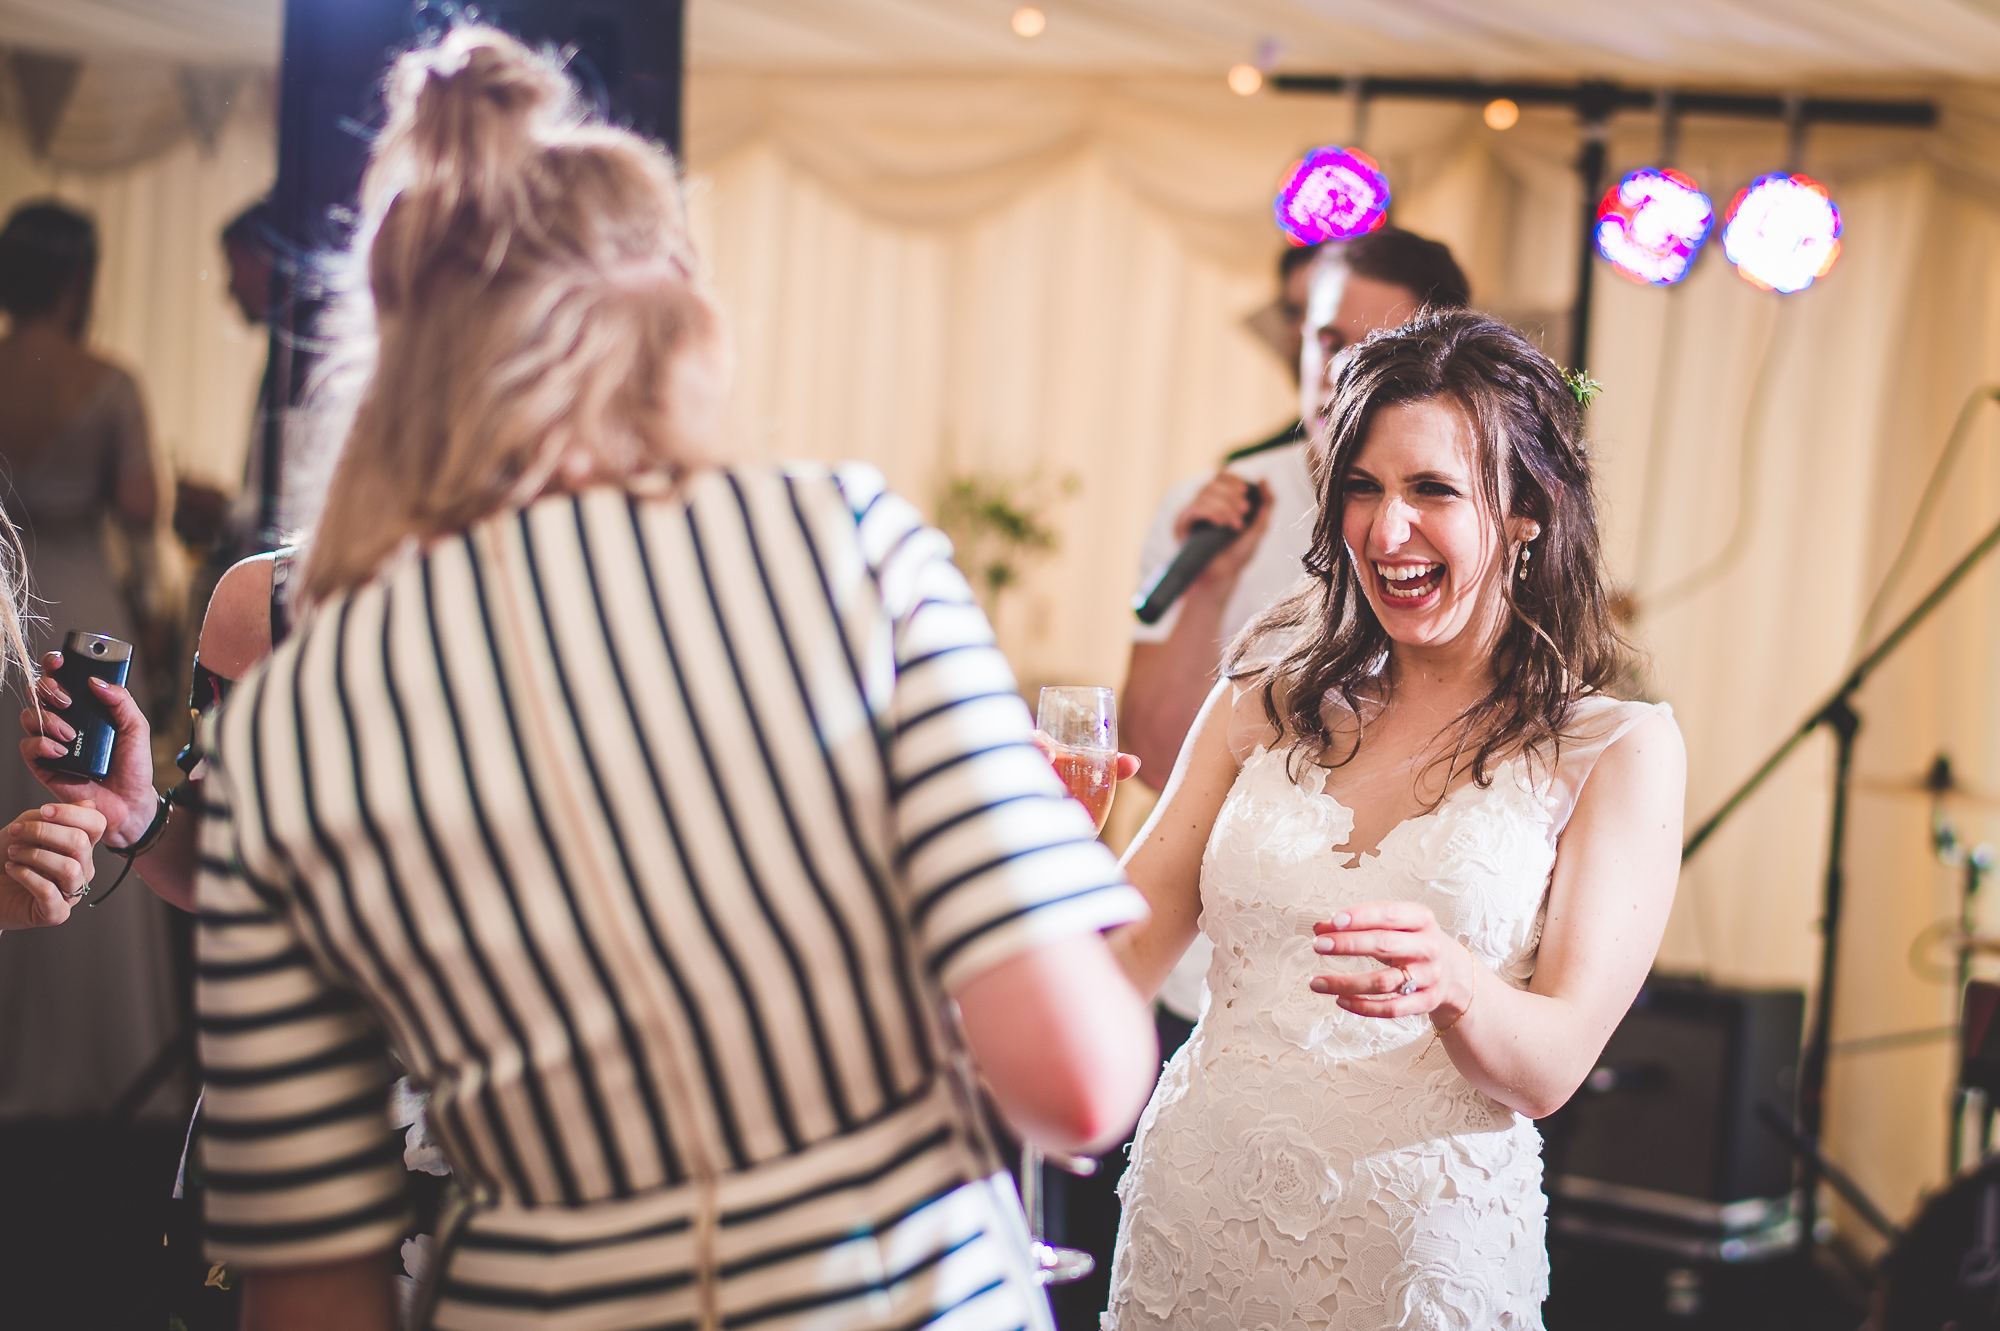 Veils & Bales Wedding Photography | Charlie & Steve SCSS 280